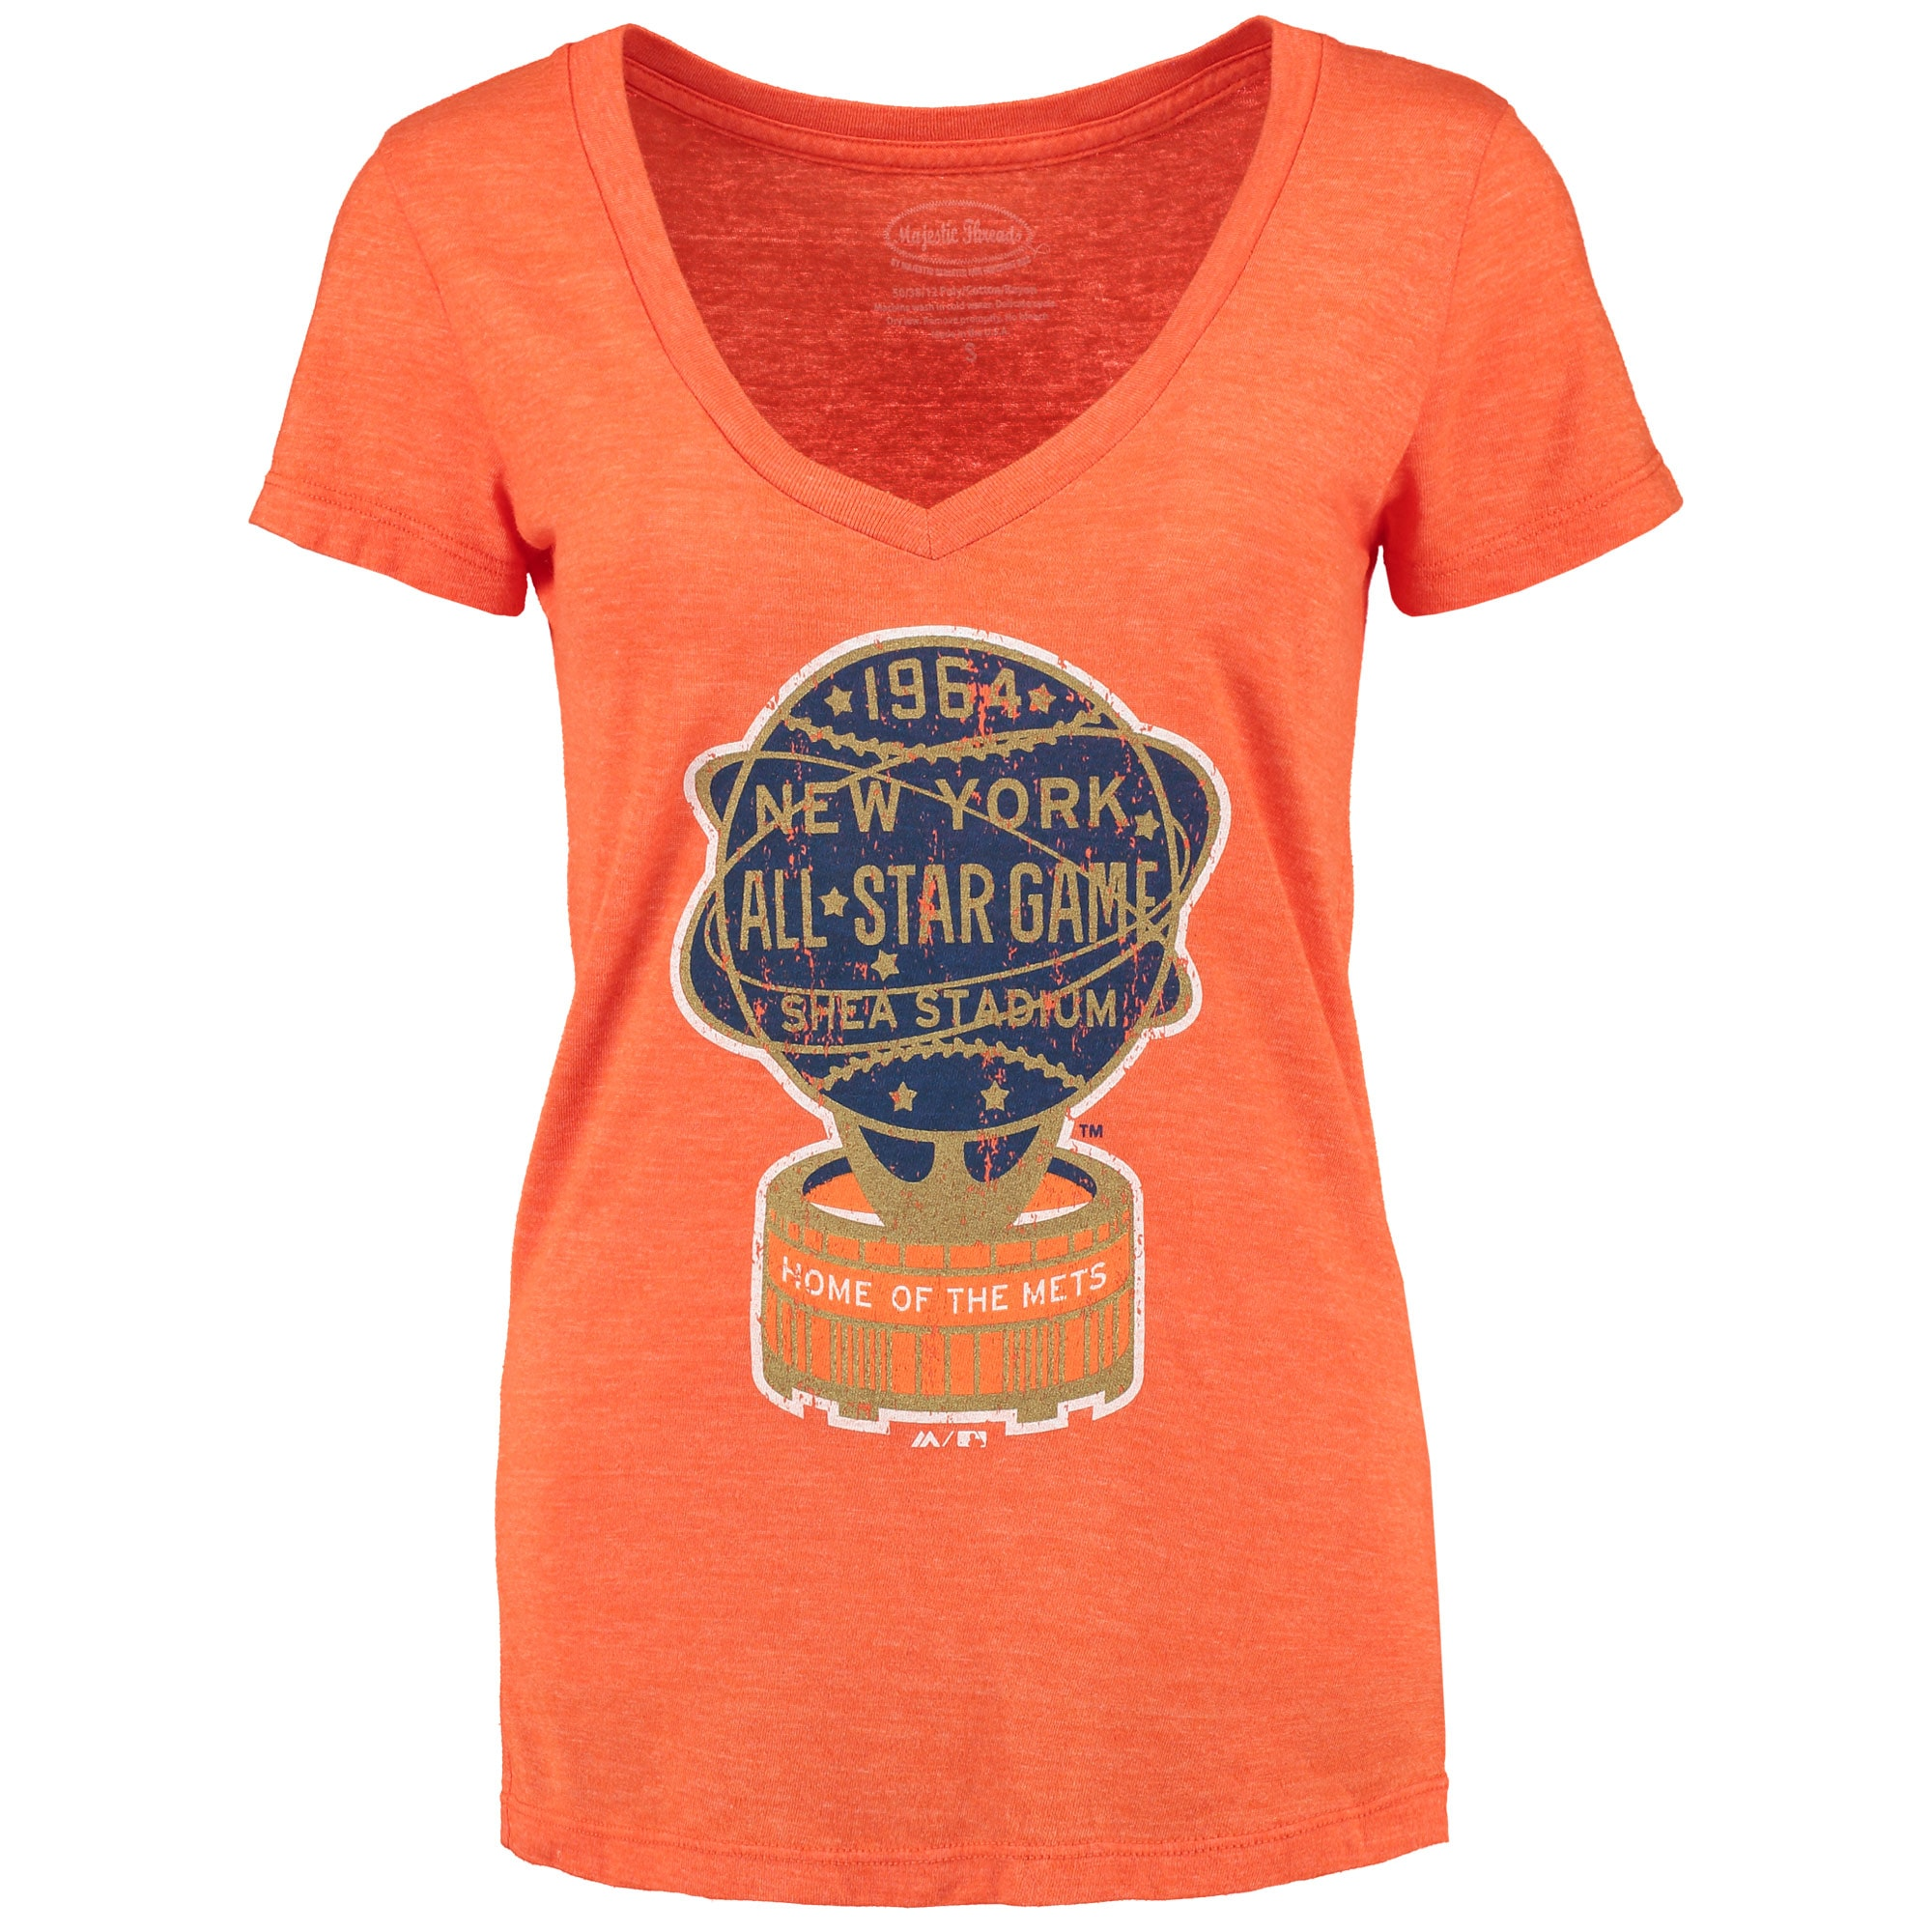 New York Mets Women's Coop All-Star Tri-Blend T-Shirt - Orange